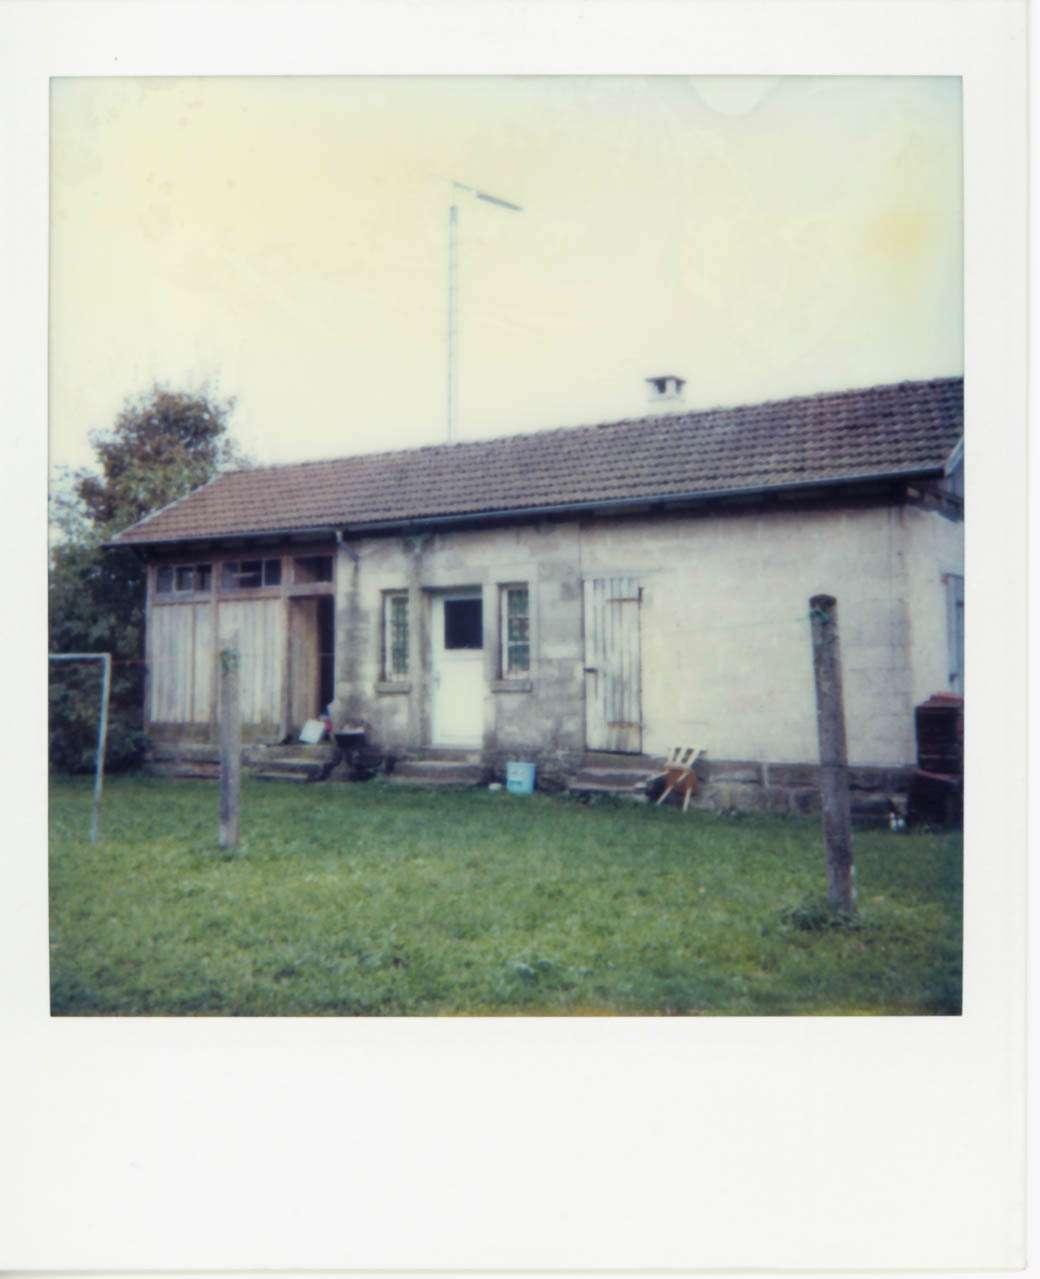 Fichtenberg: 3 Fotos u.a., Bild 2